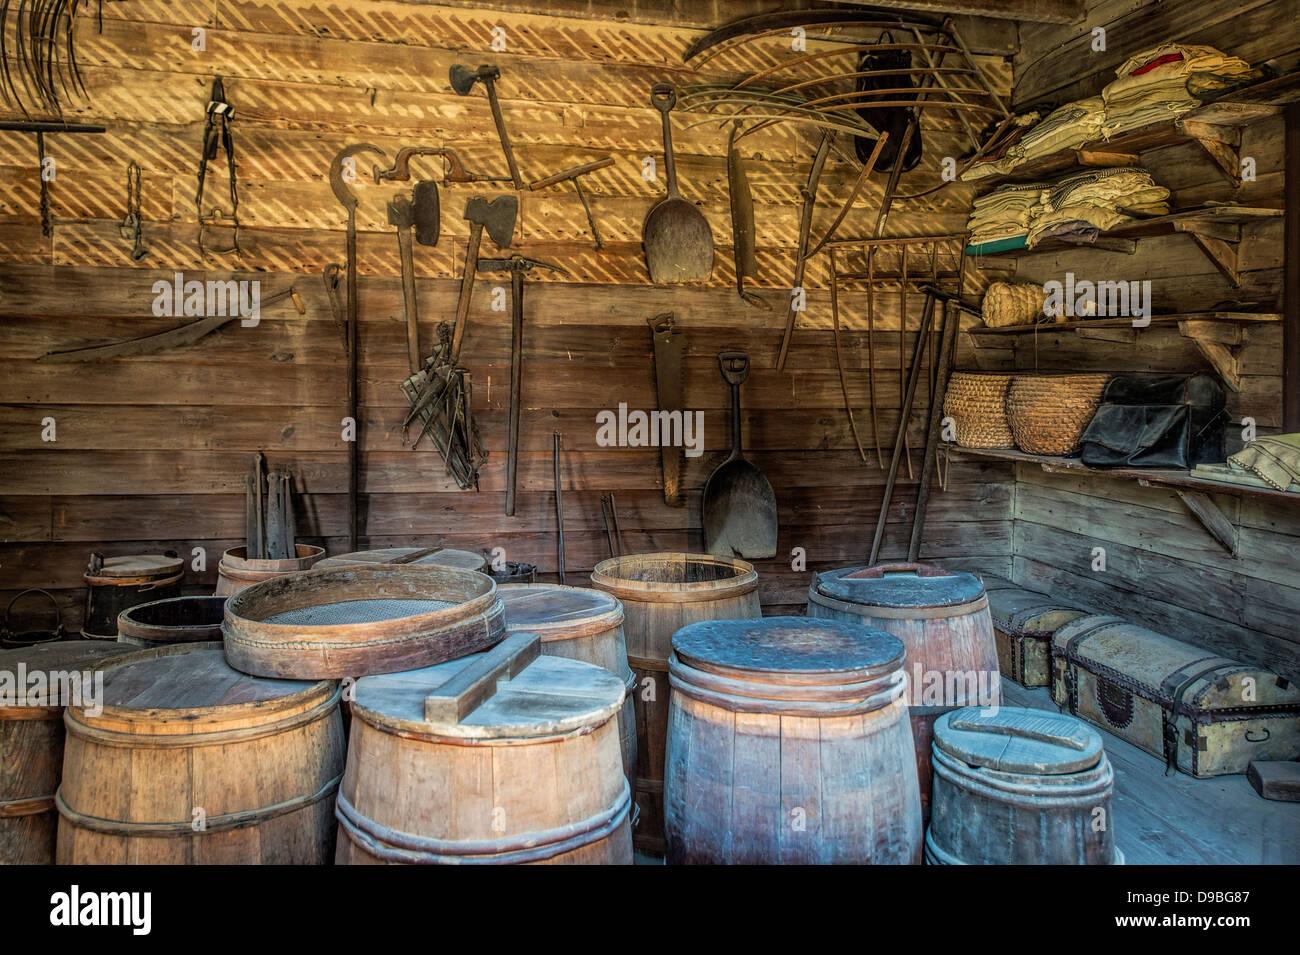 The supply storeroom at Mt Vernon, the estate of George Washington, Virginia, USA - Stock Image